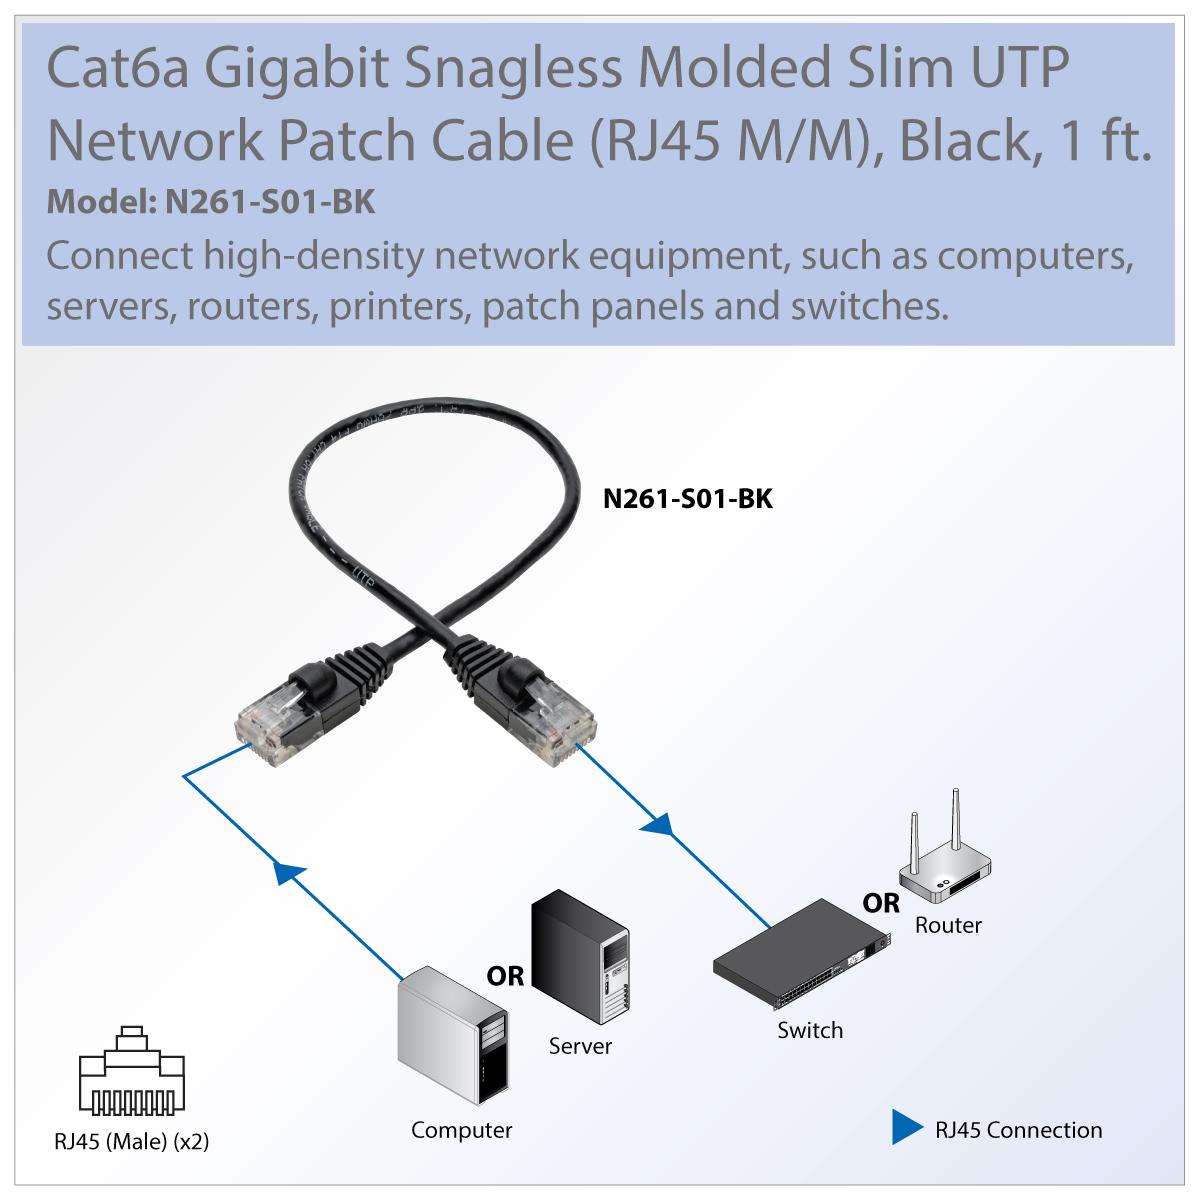 hight resolution of provantage tripp lite n261 s01 bk 1ft cat6a black gigabit patch cable snagless molded slim utp m m